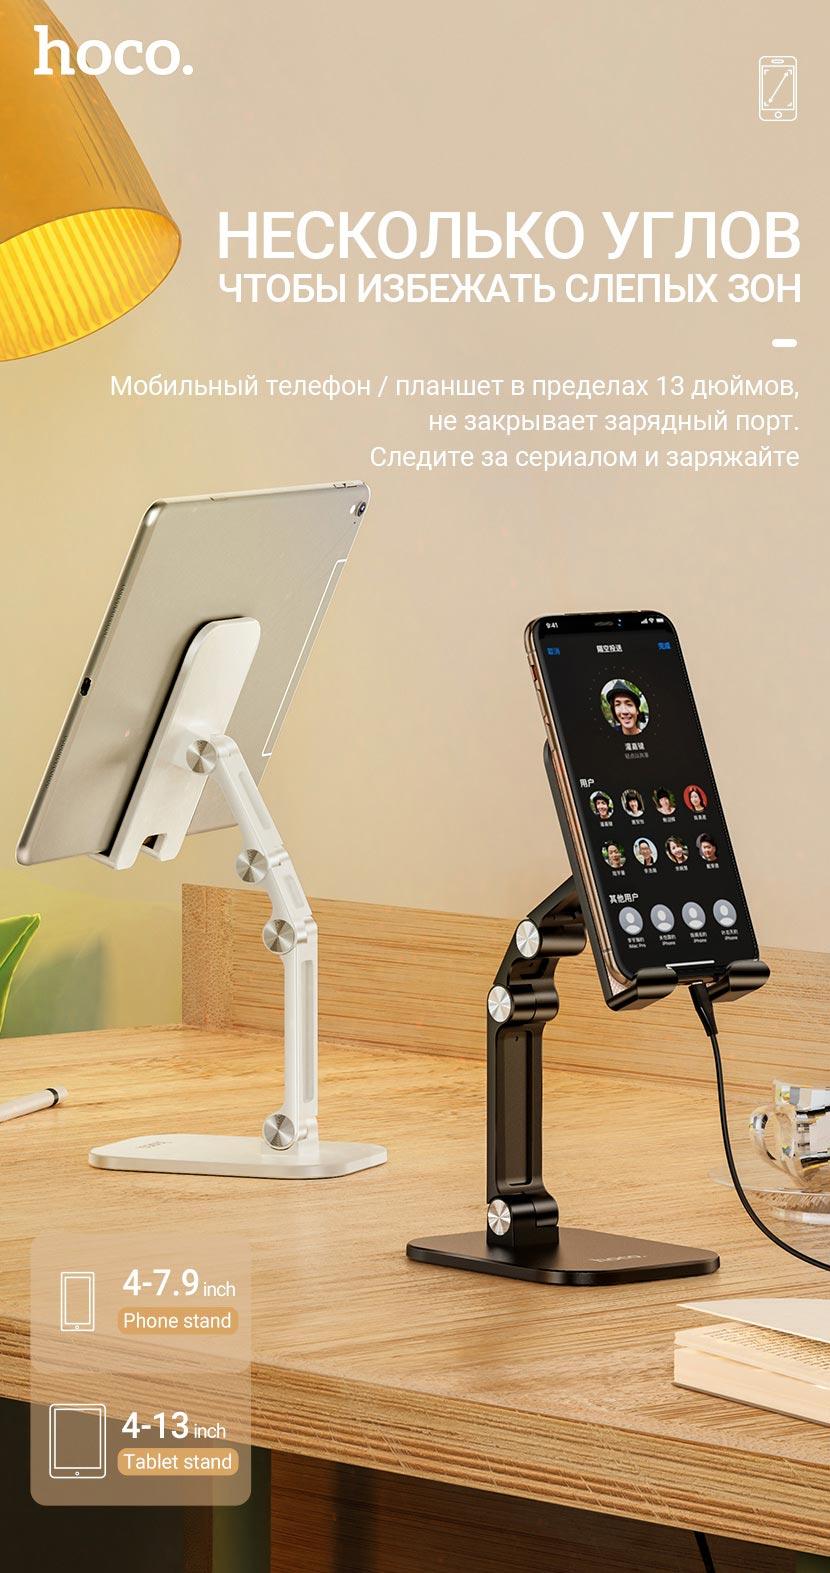 hoco news ph34 excelente double folding desktop stand phone tablet ru